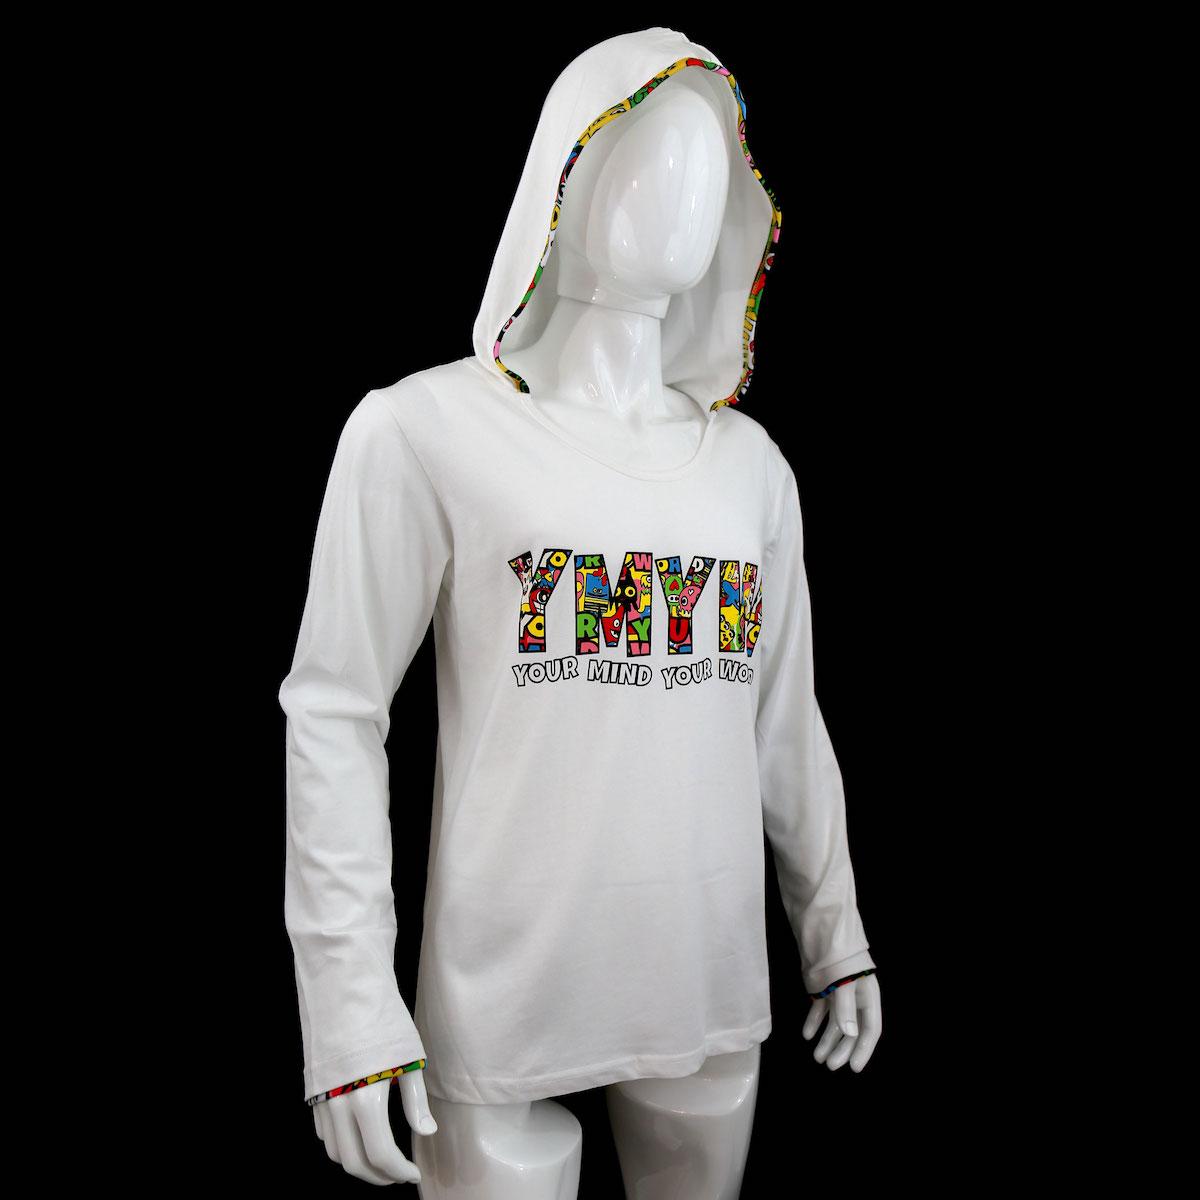 Unique hoodies for men